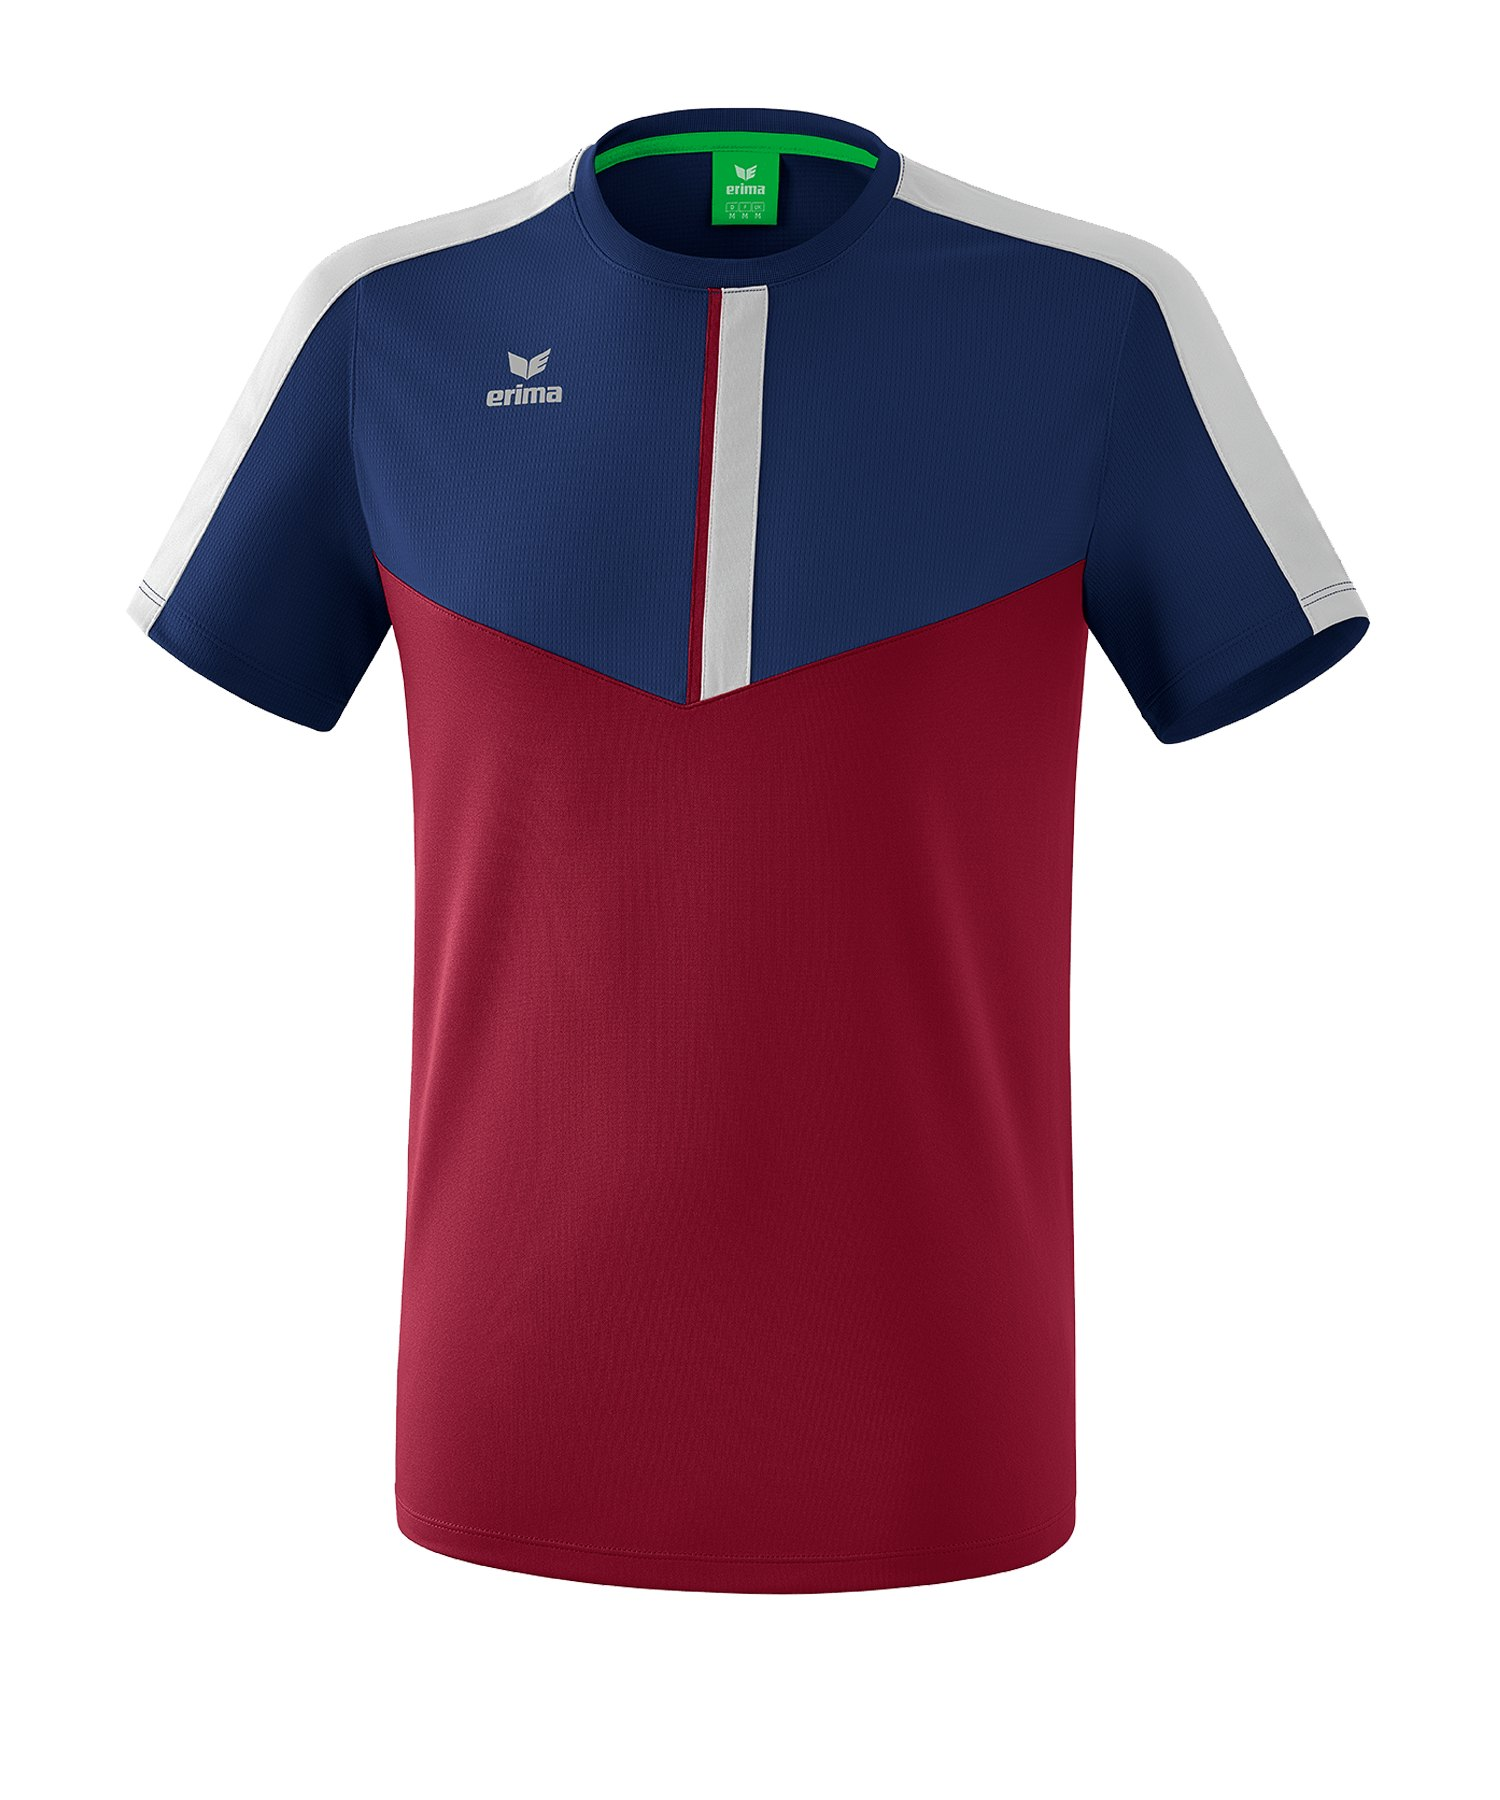 Erima Squad T-Shirt Blau Rot - blau